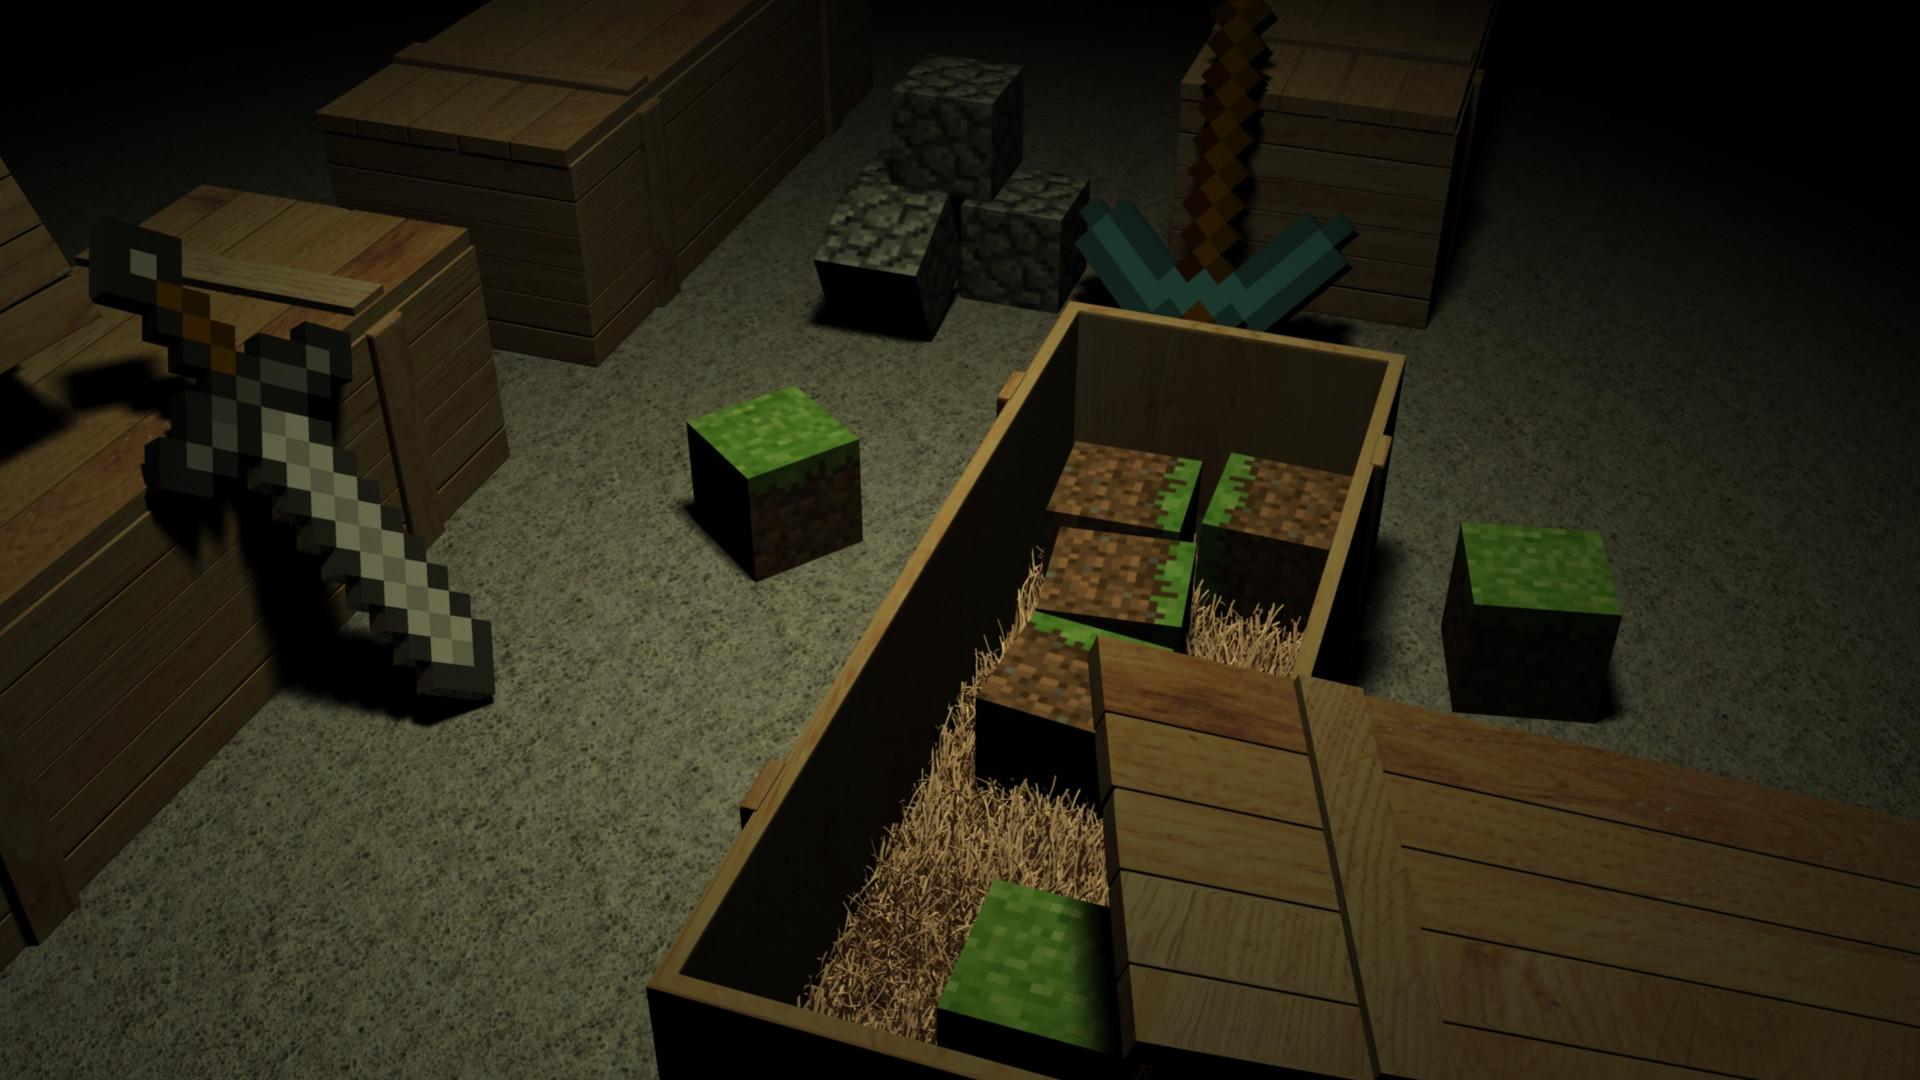 Minecraft Wallpapers Hintergr252nde 1920x1080 ID423532 1920x1080